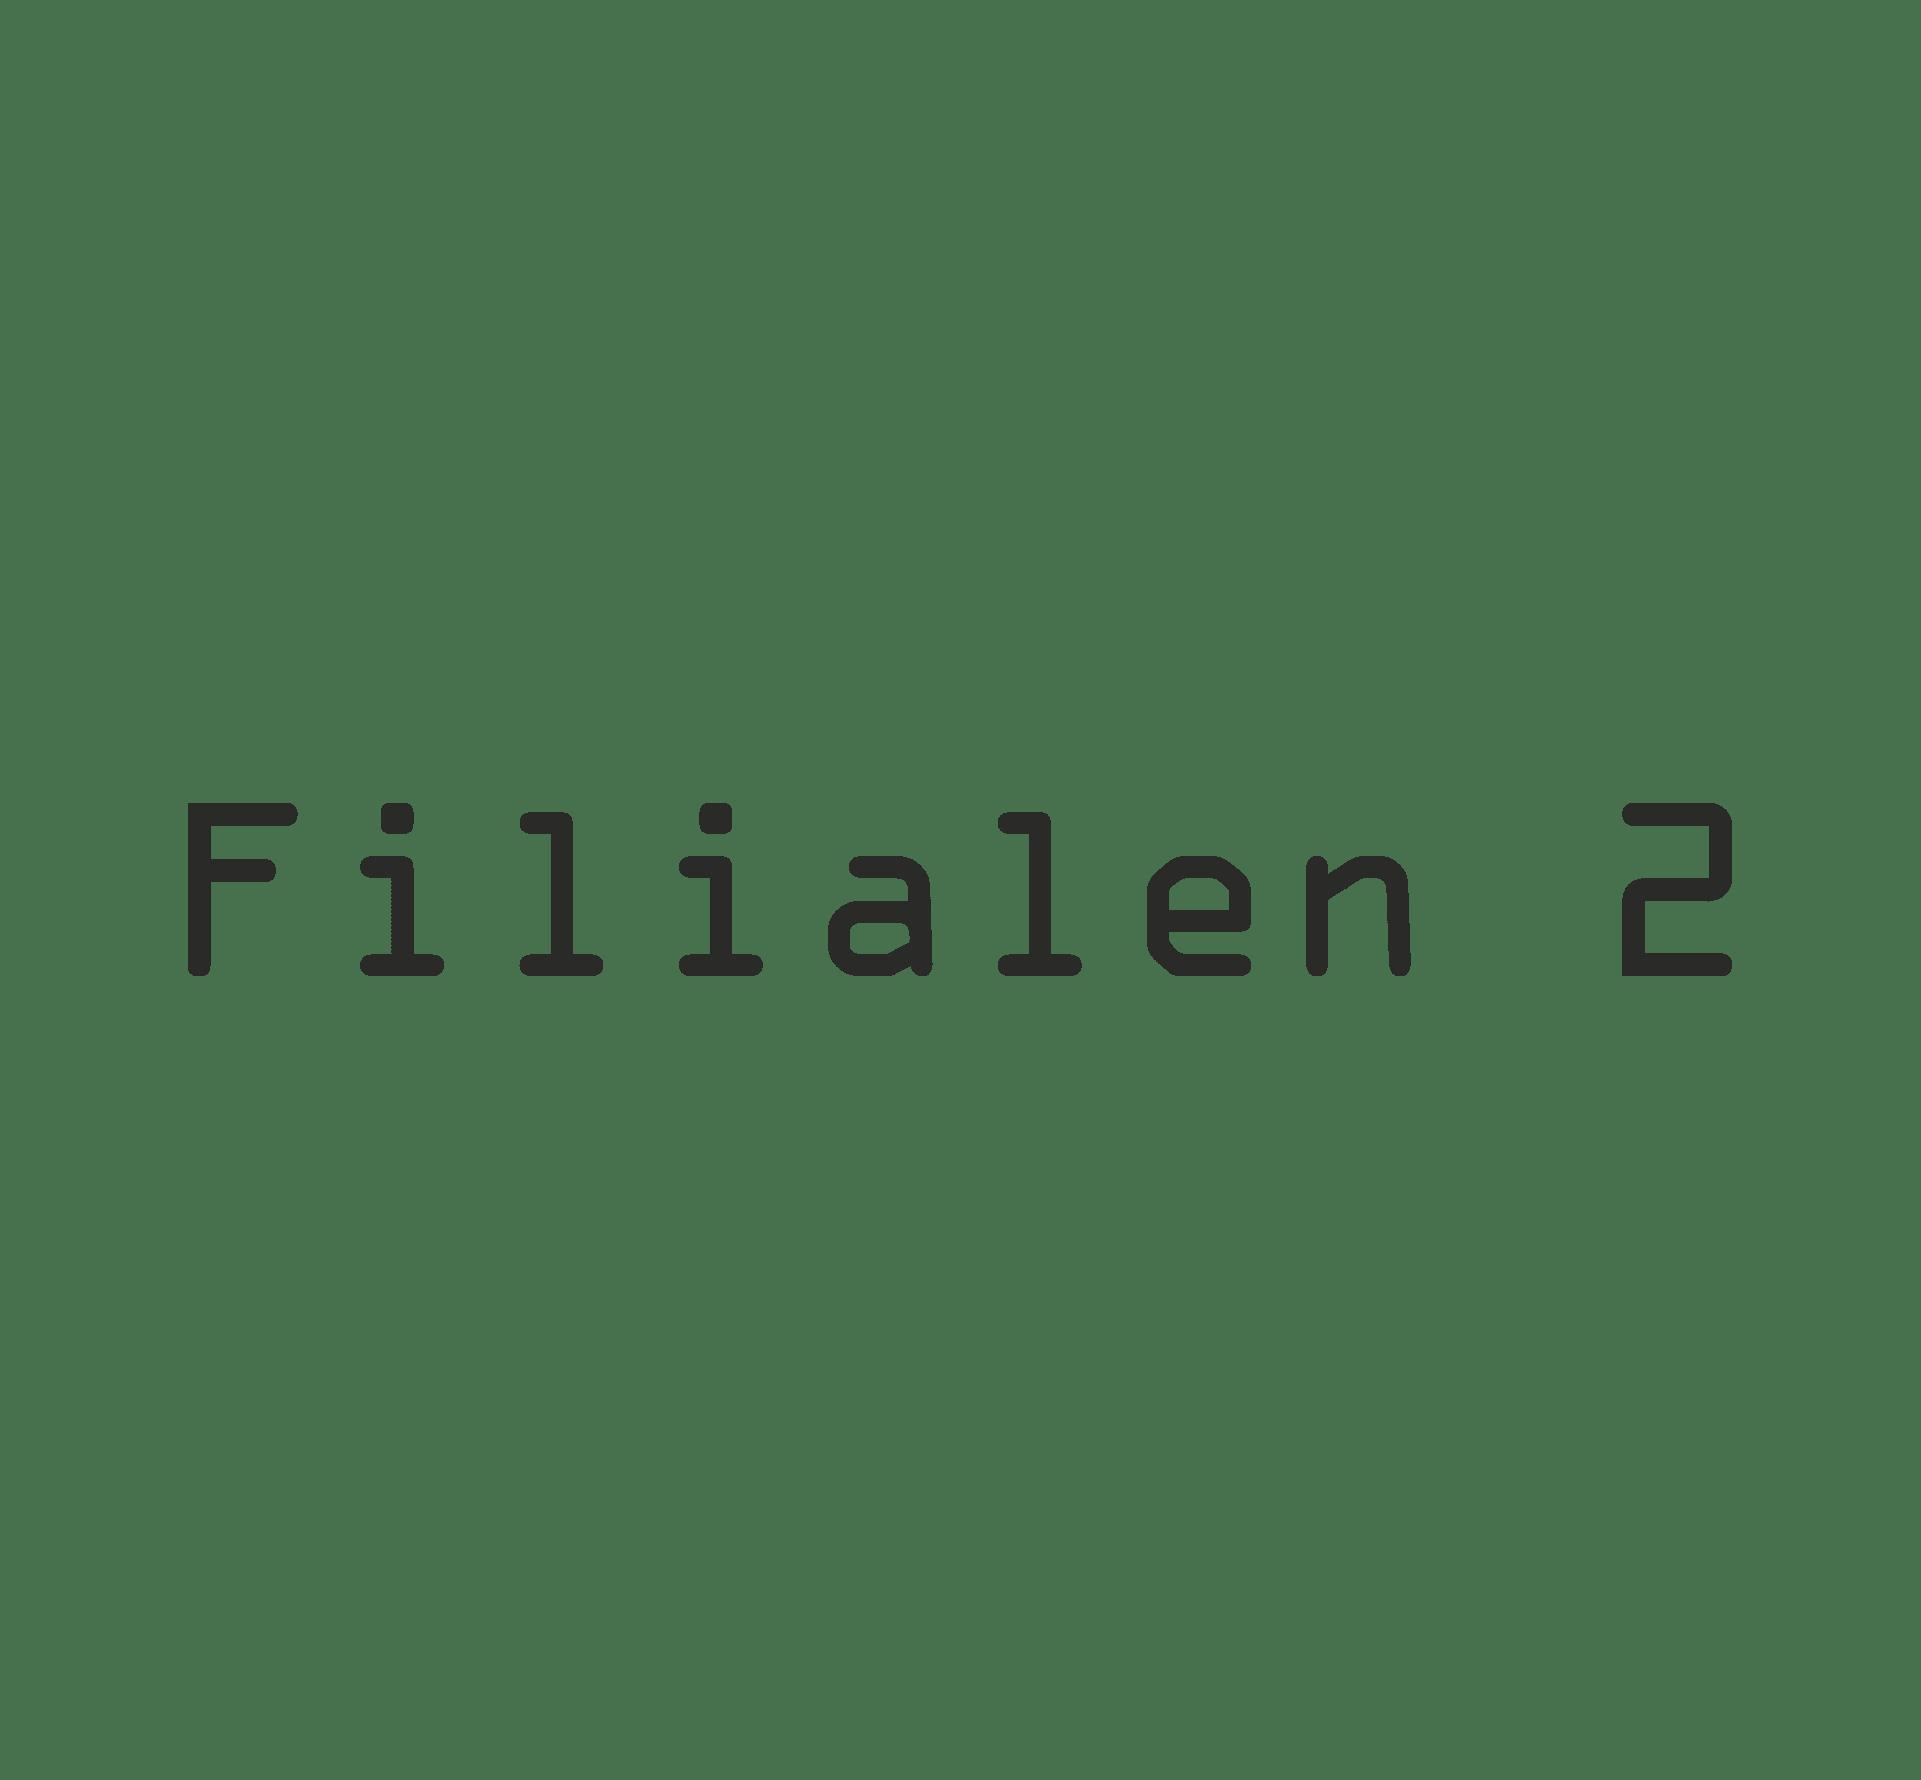 filialen-2